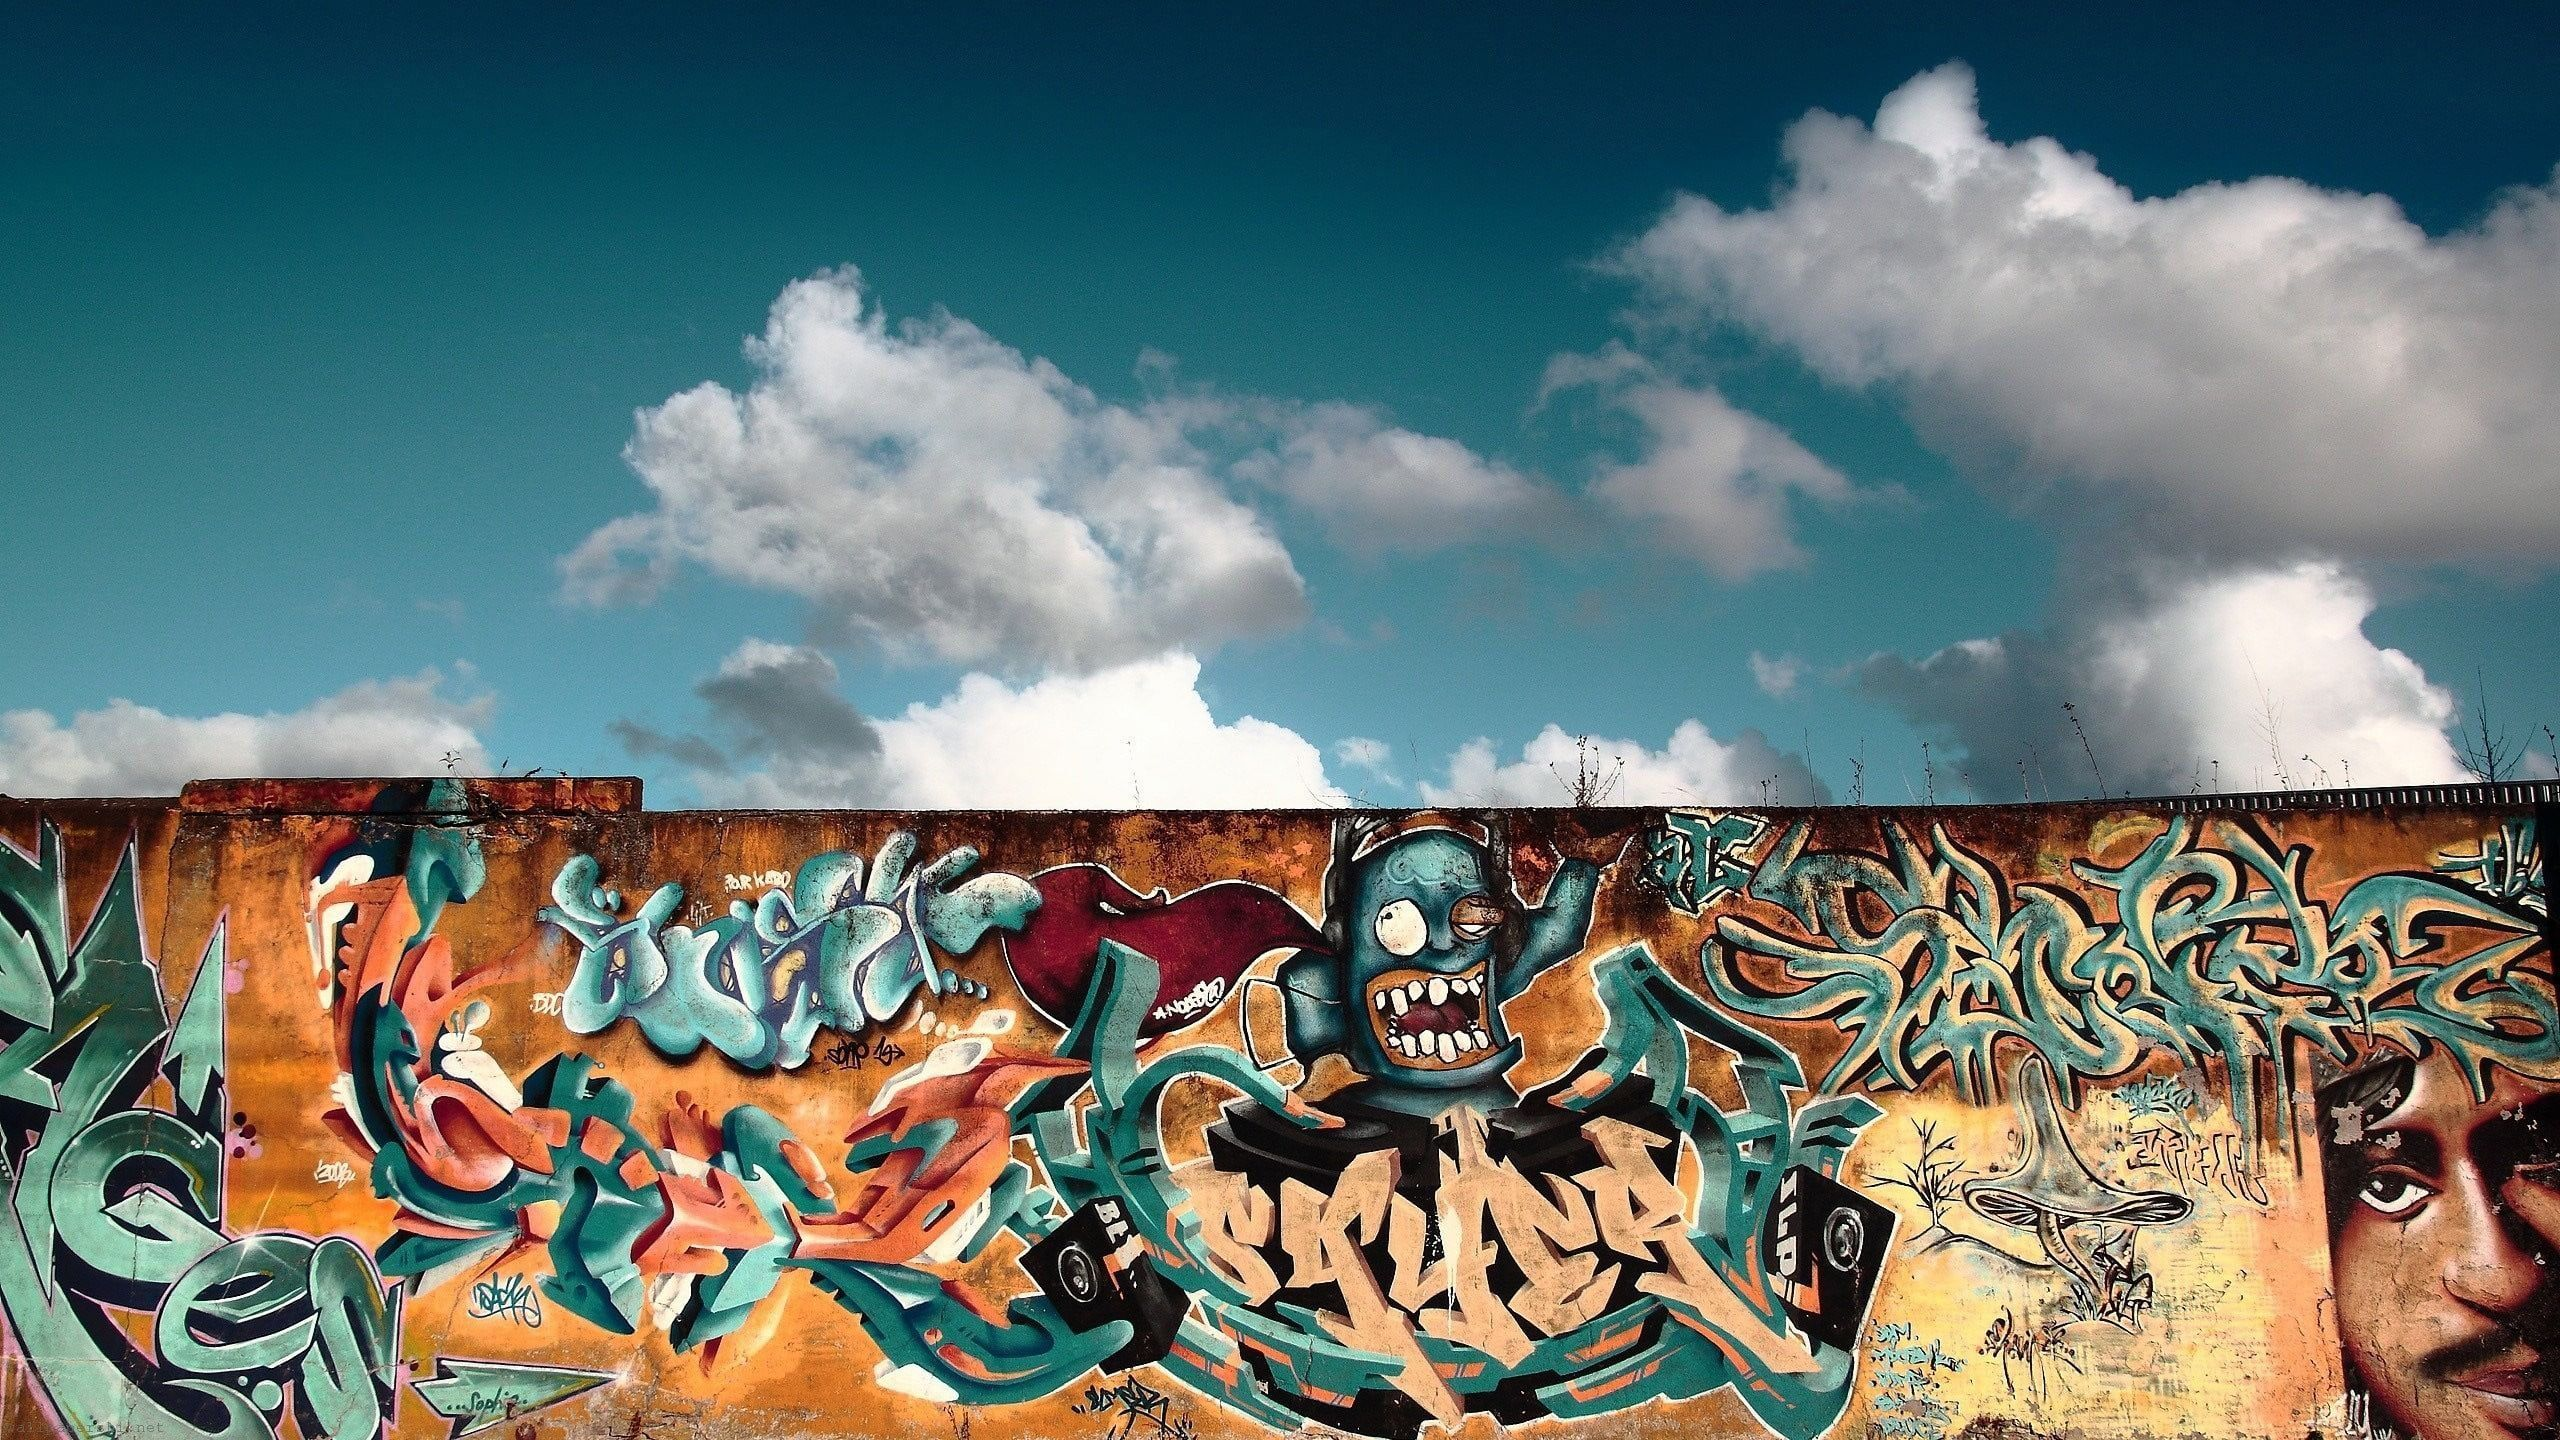 Berlin Wall Wallpapers Top Free Berlin Wall Backgrounds Wallpaperaccess